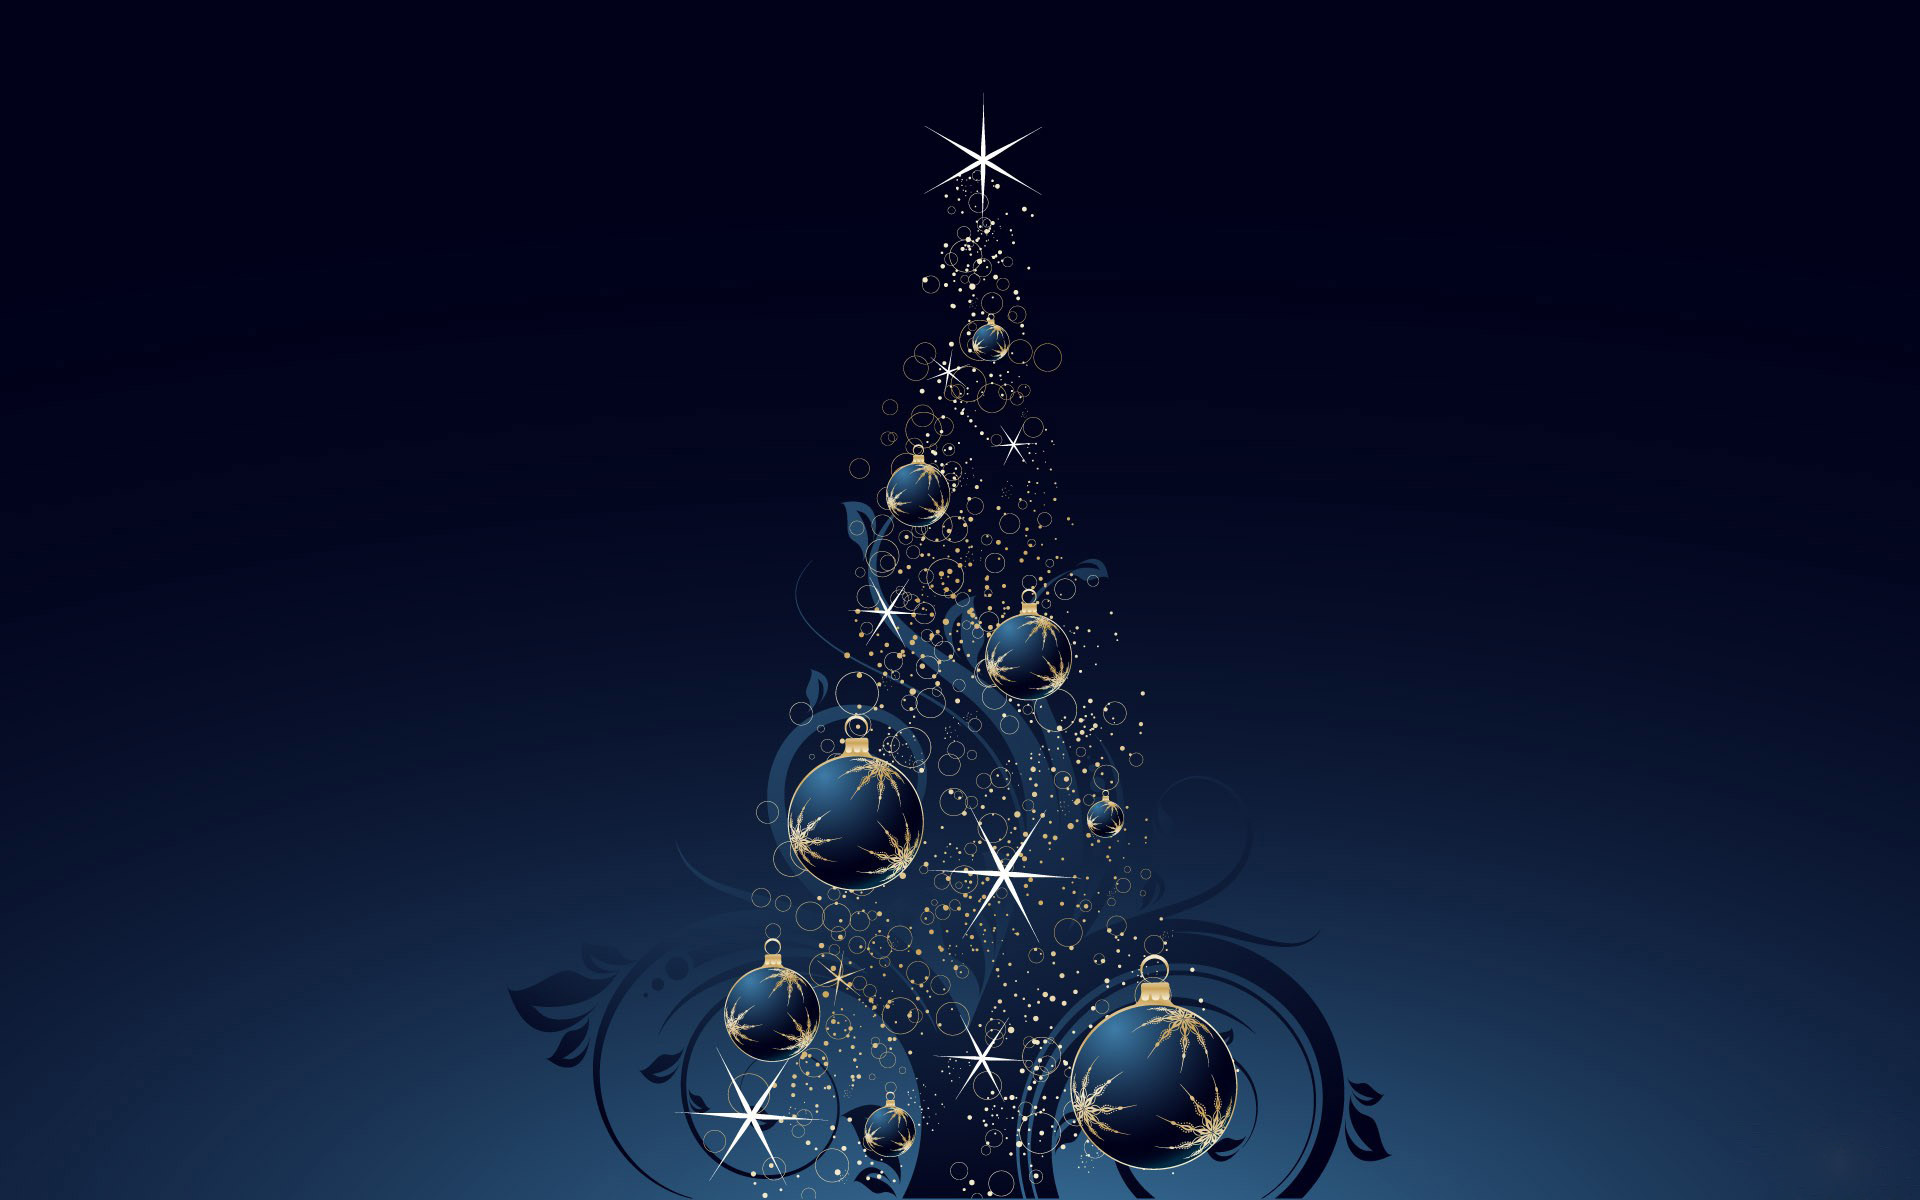 free christmas tree desktop wallpaper 2015 – Grasscloth Wallpaper